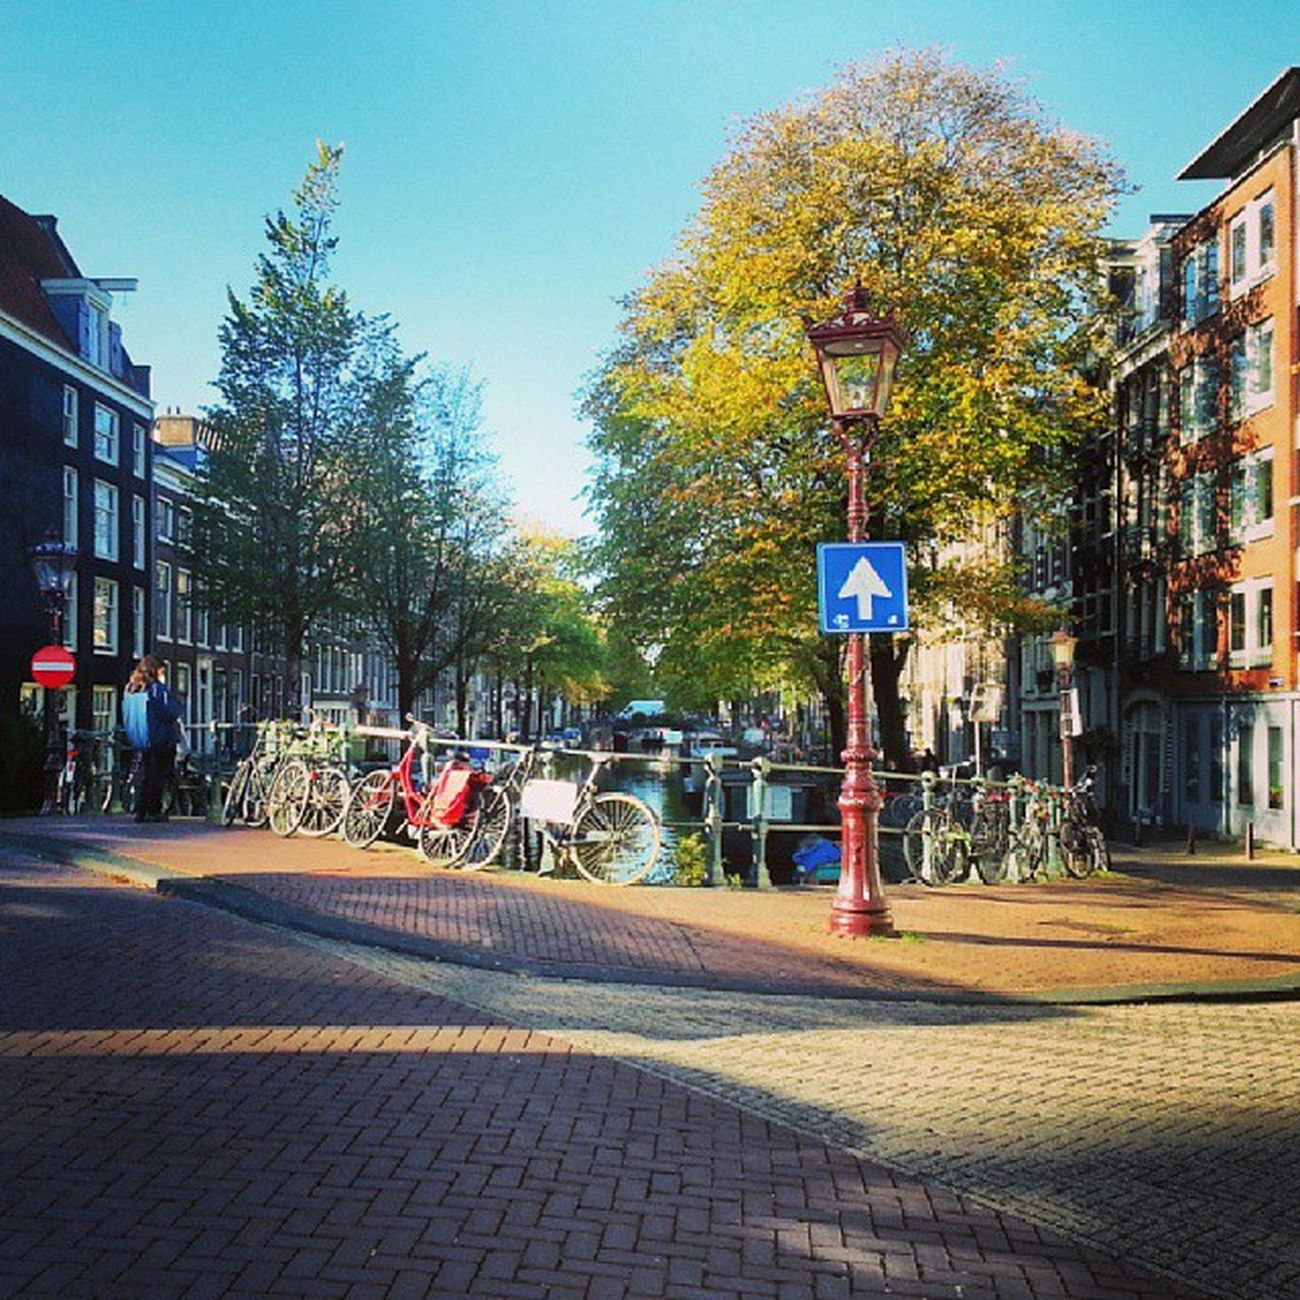 Gisteren leuk dagje Amsterdam geweest!! Amsterdam Grachten Sun Jordaan autumn